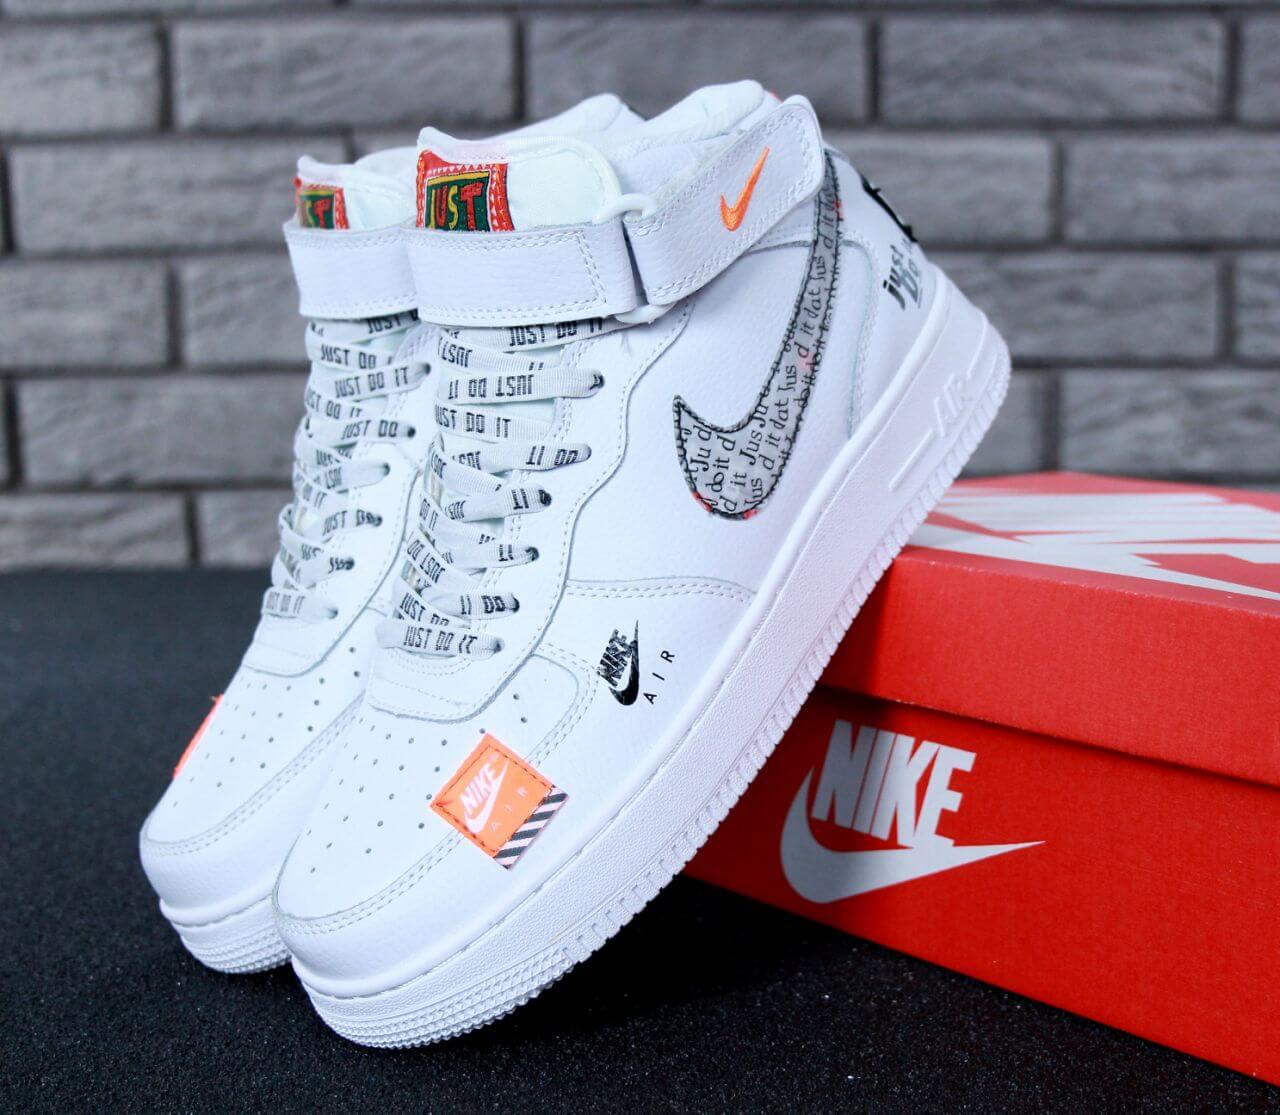 61f1fa10 Кроссовки Nike Air Force 1 Mid White Just Do It - Интернет магазин обуви «im